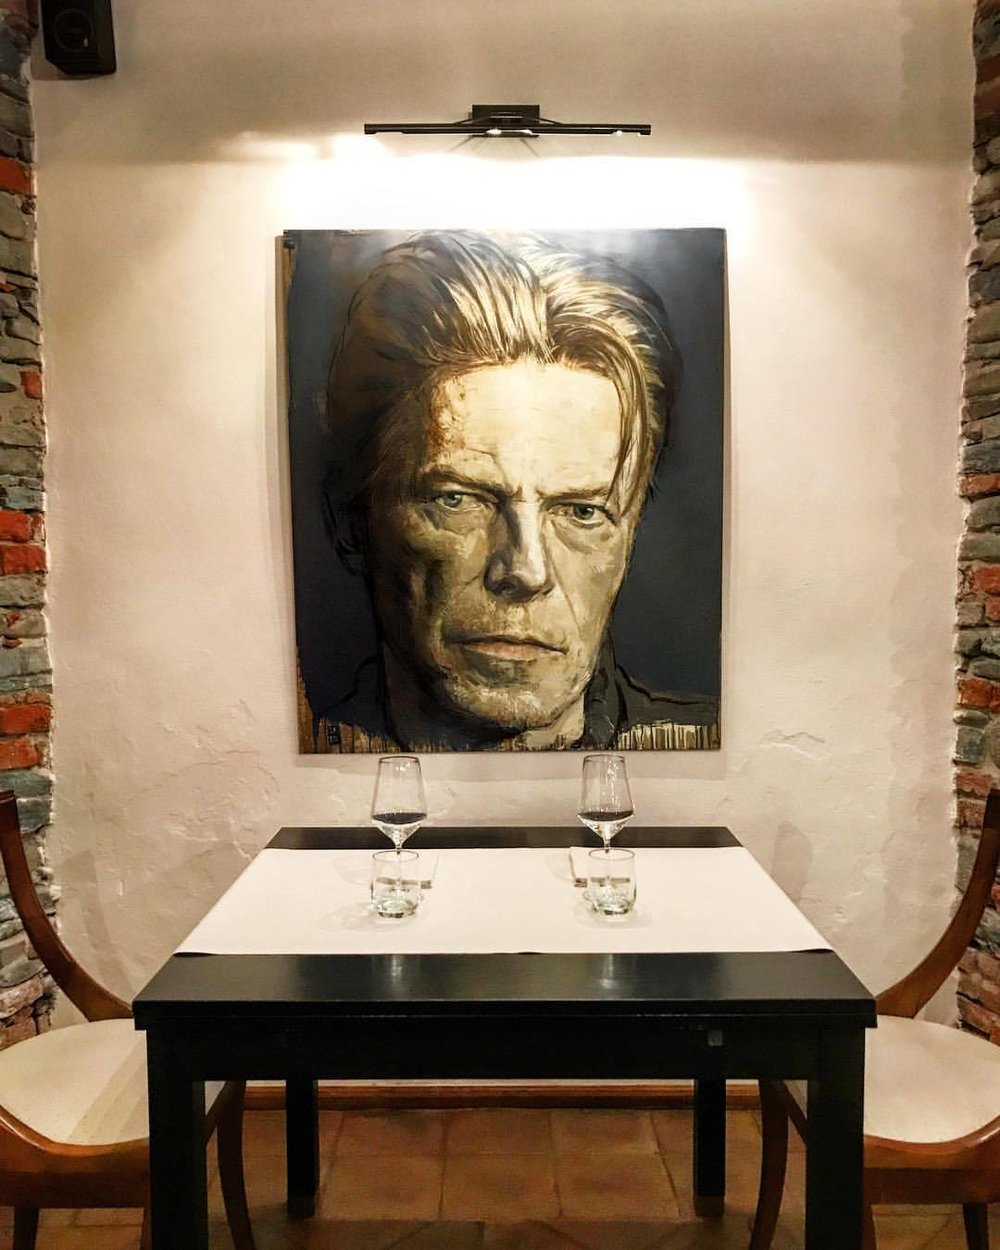 Dinner with Bowie.  -  #italy #piedmont #art #bowie #ziggystardust  (at Dogliani)